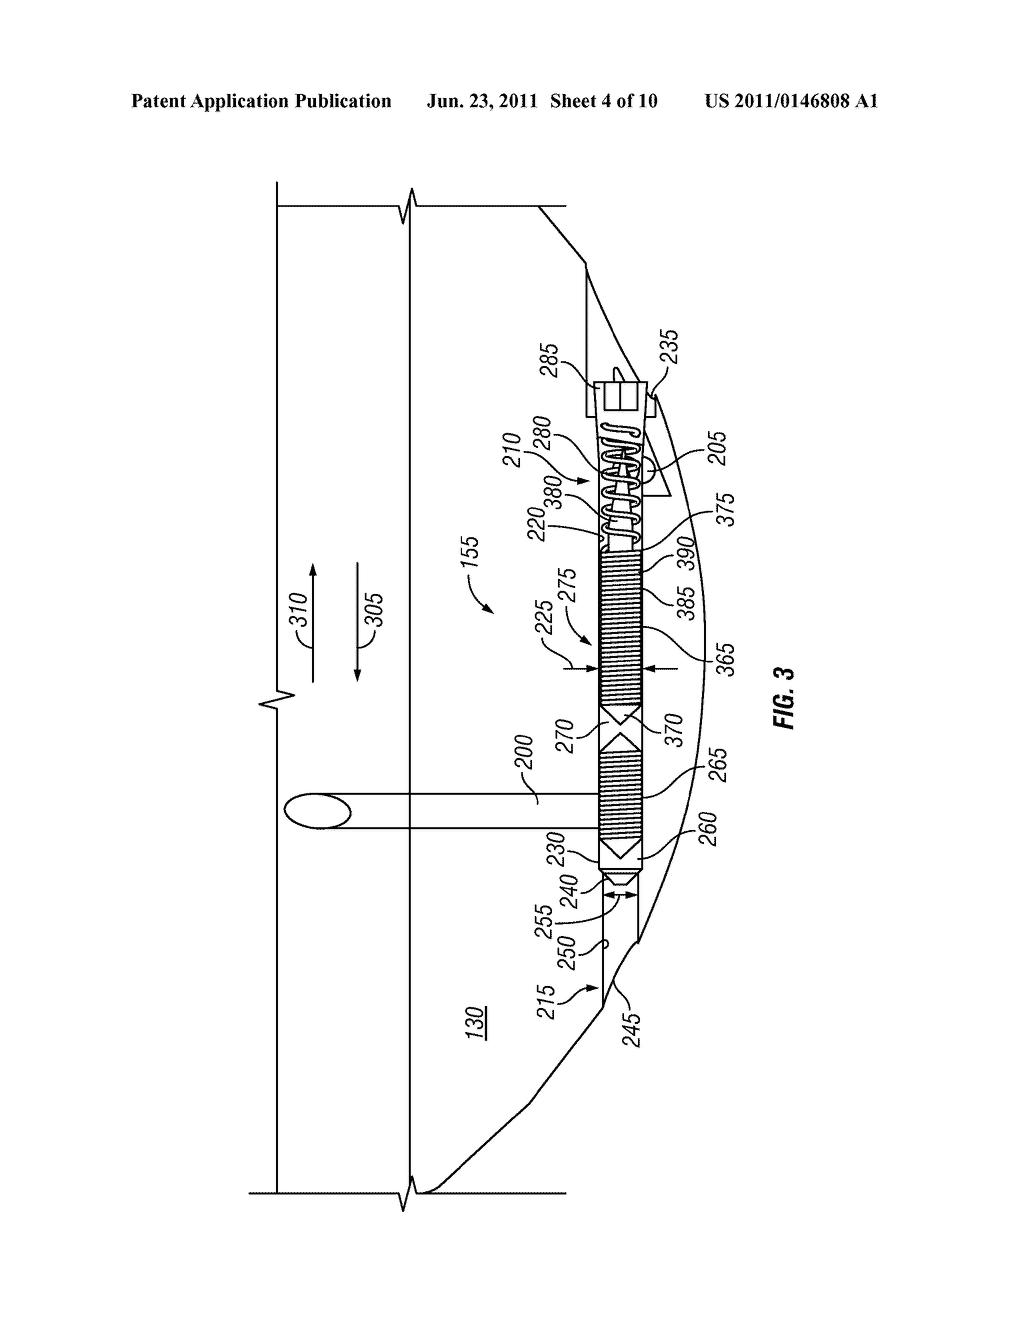 Directional Valve Schematics Trusted Wiring Diagrams Pressure Relief Symbol Schematic Bidirectional Explore Diagram U2022 Hydraulic Symbols Transducer